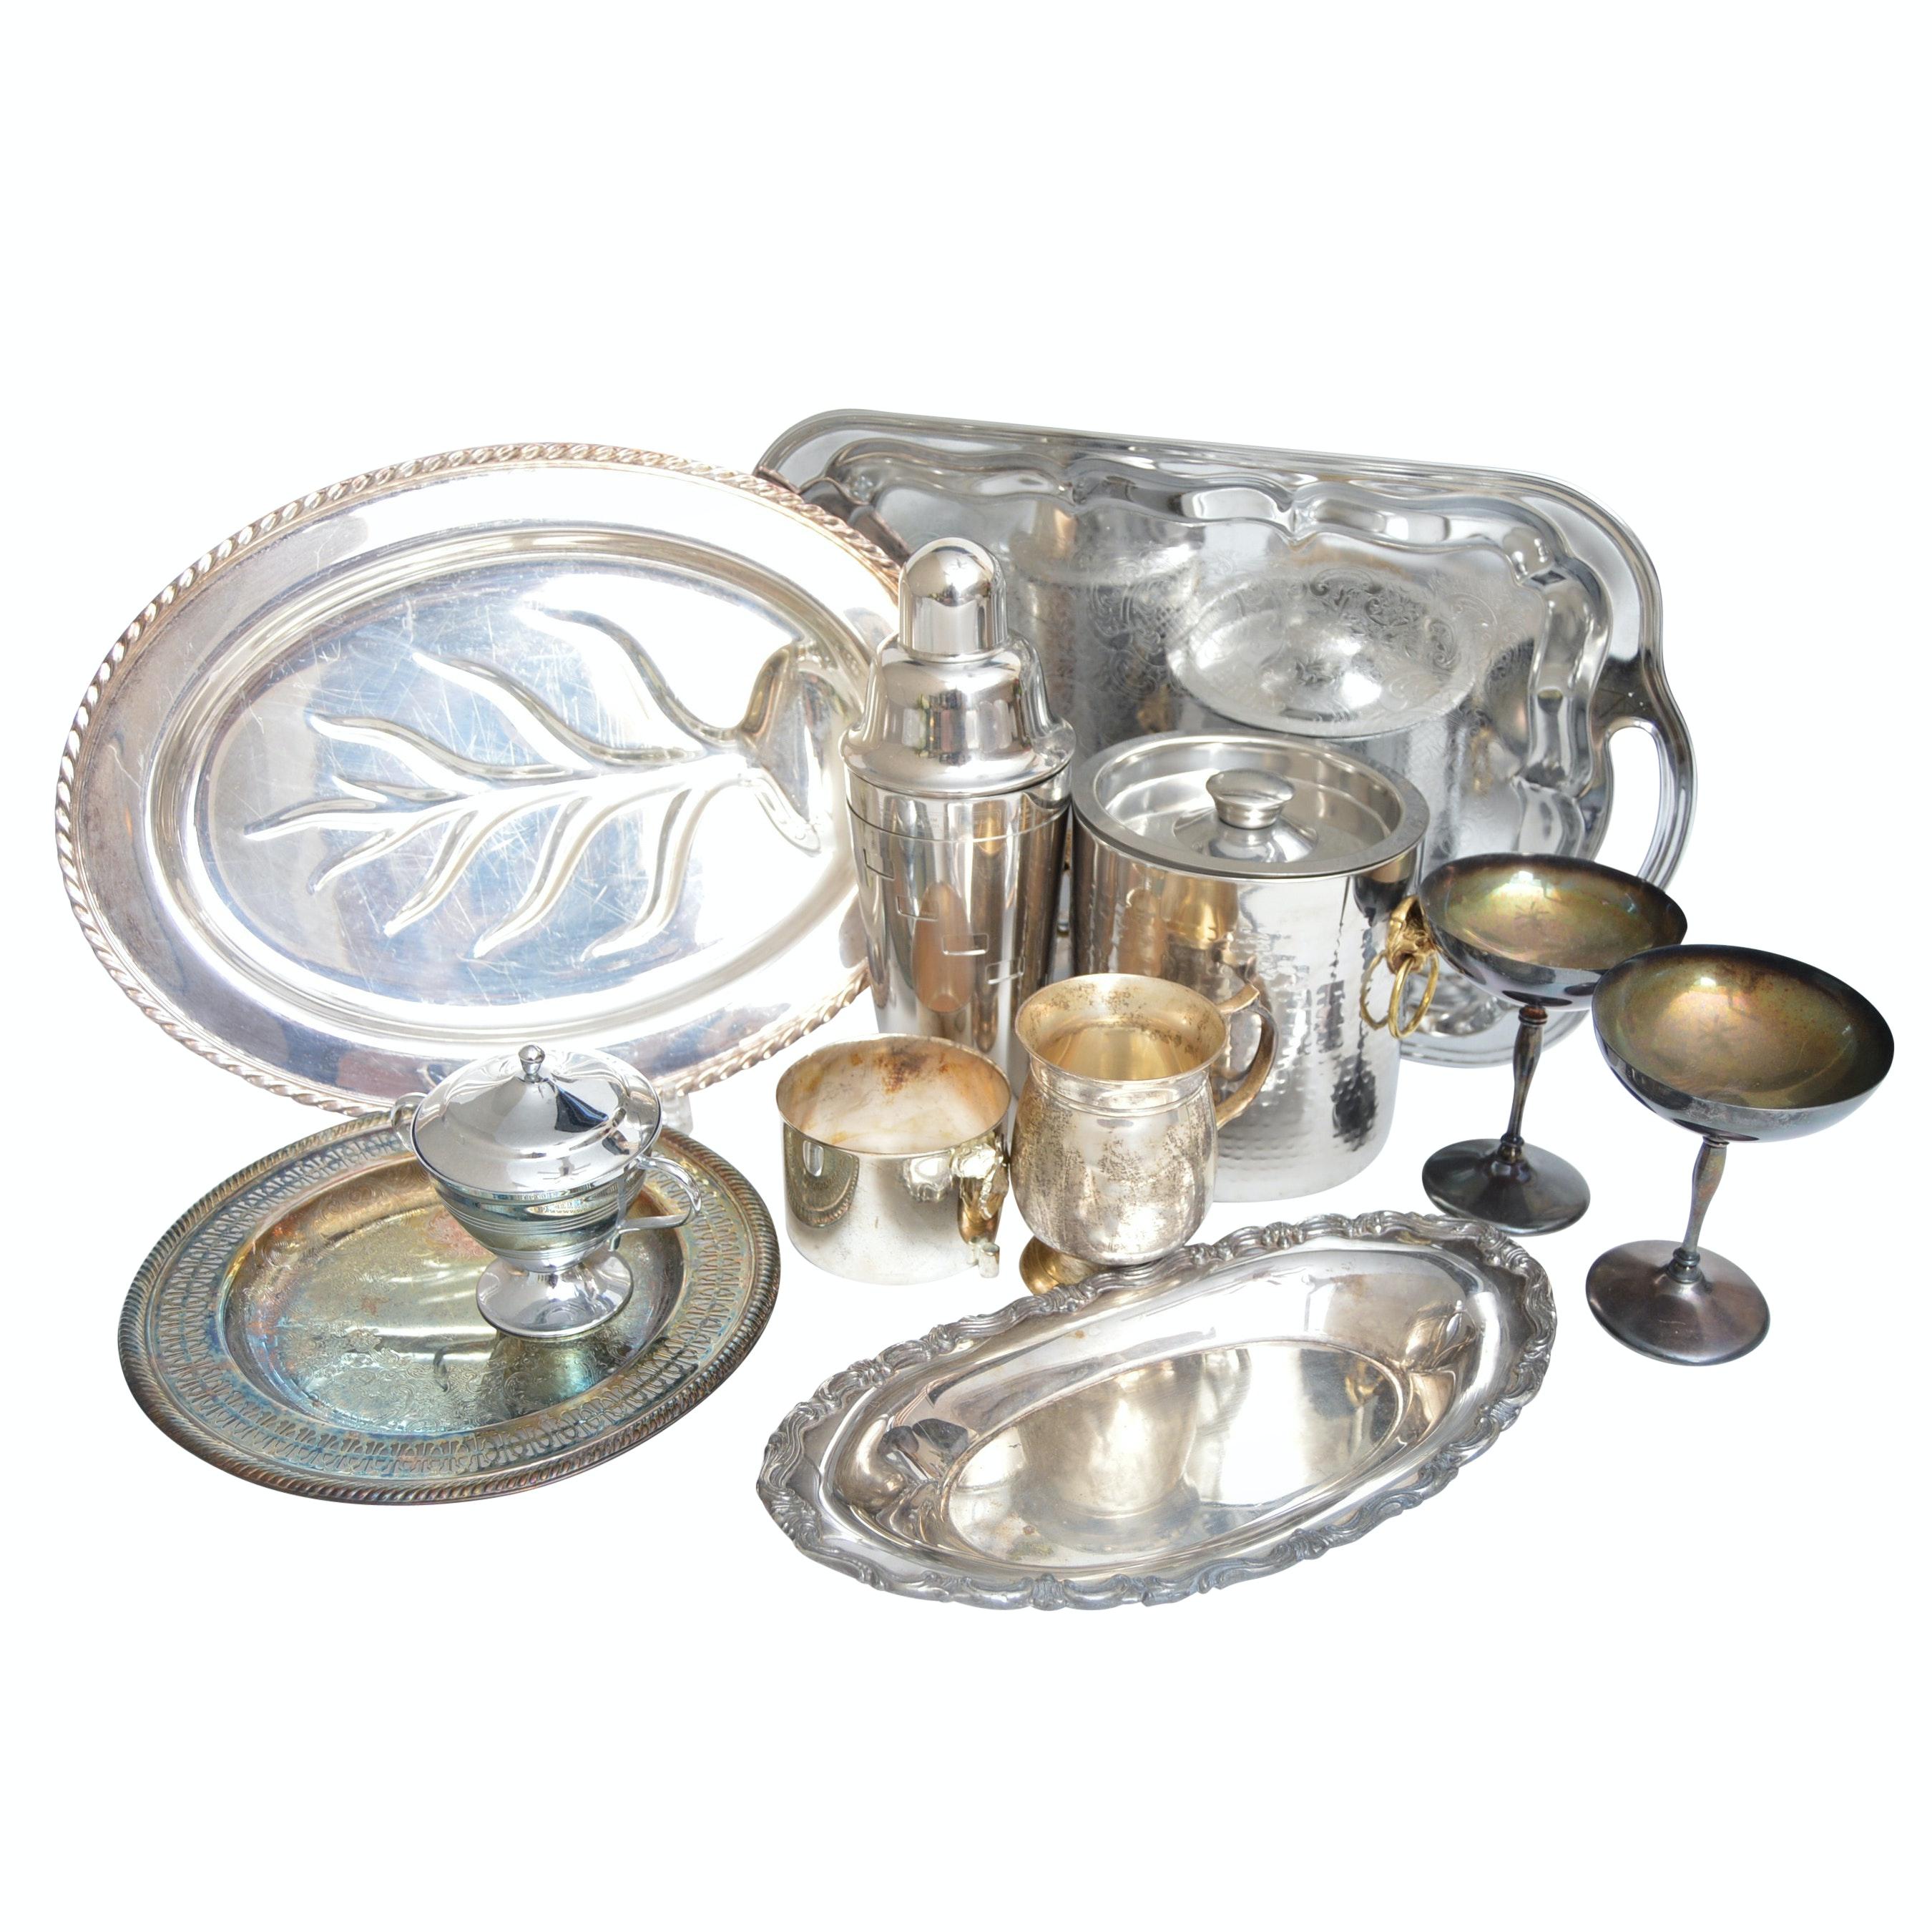 Silverplate Serveware and Barware